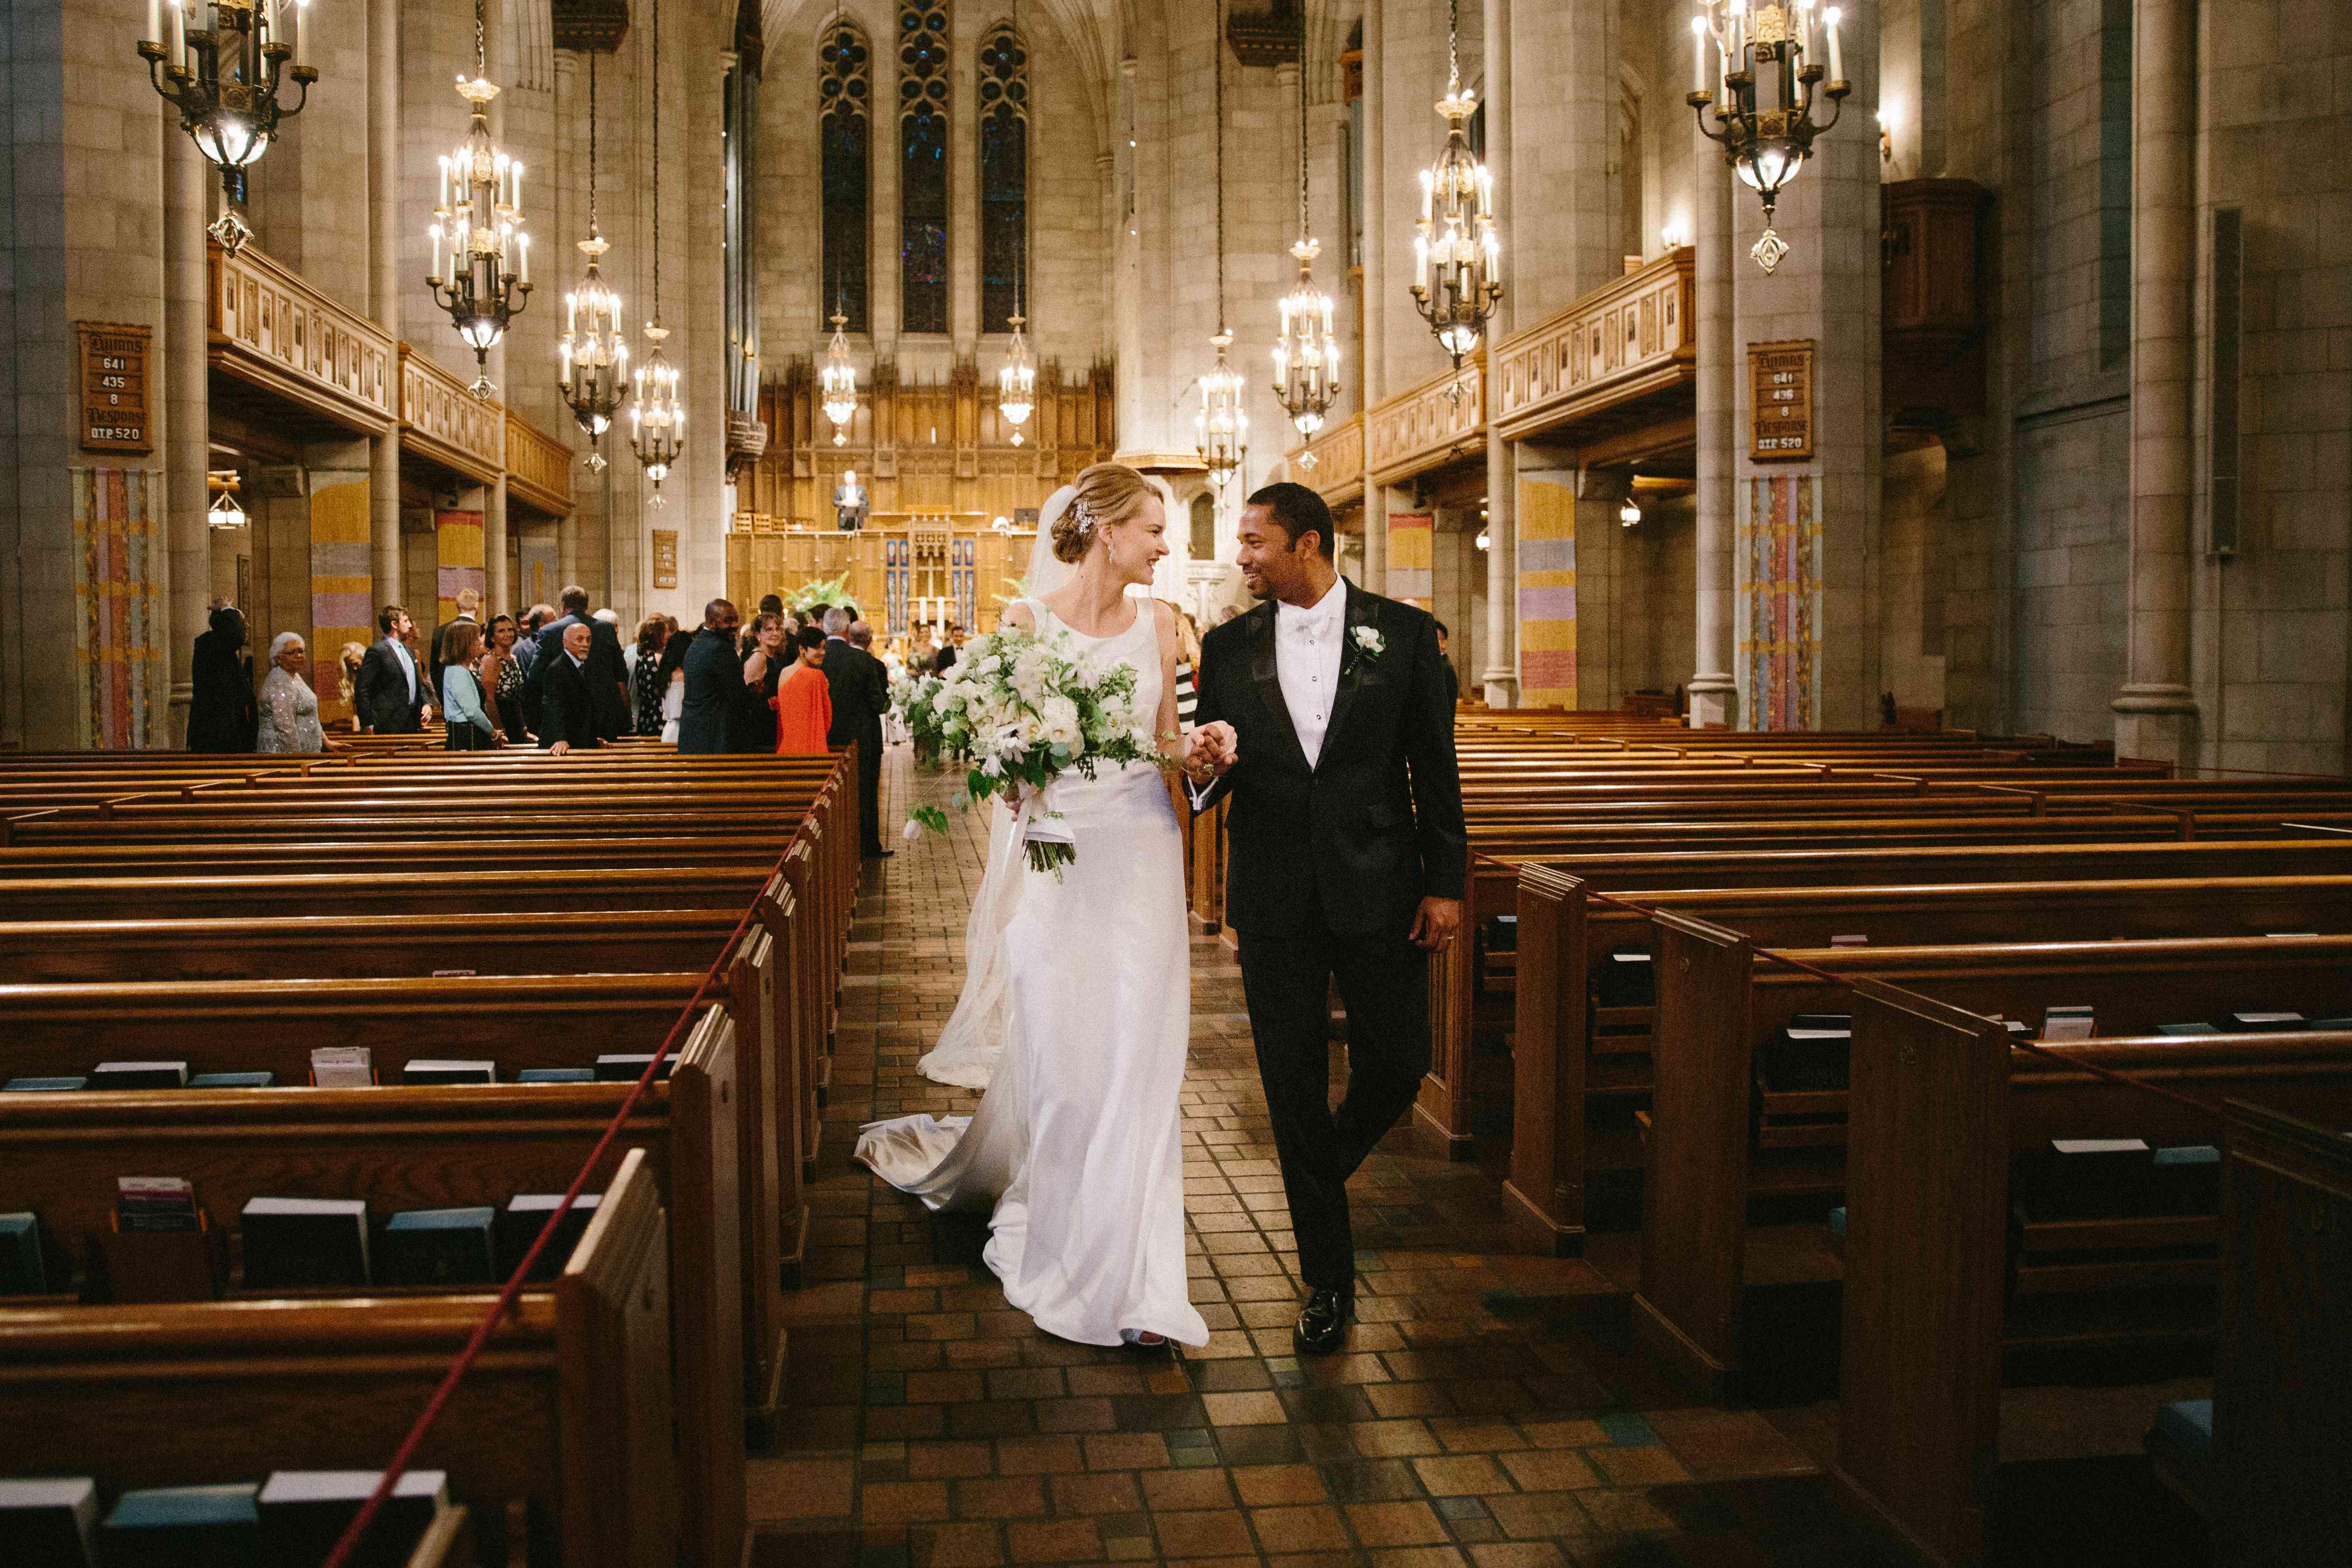 Post-Ceremony Newlyweds